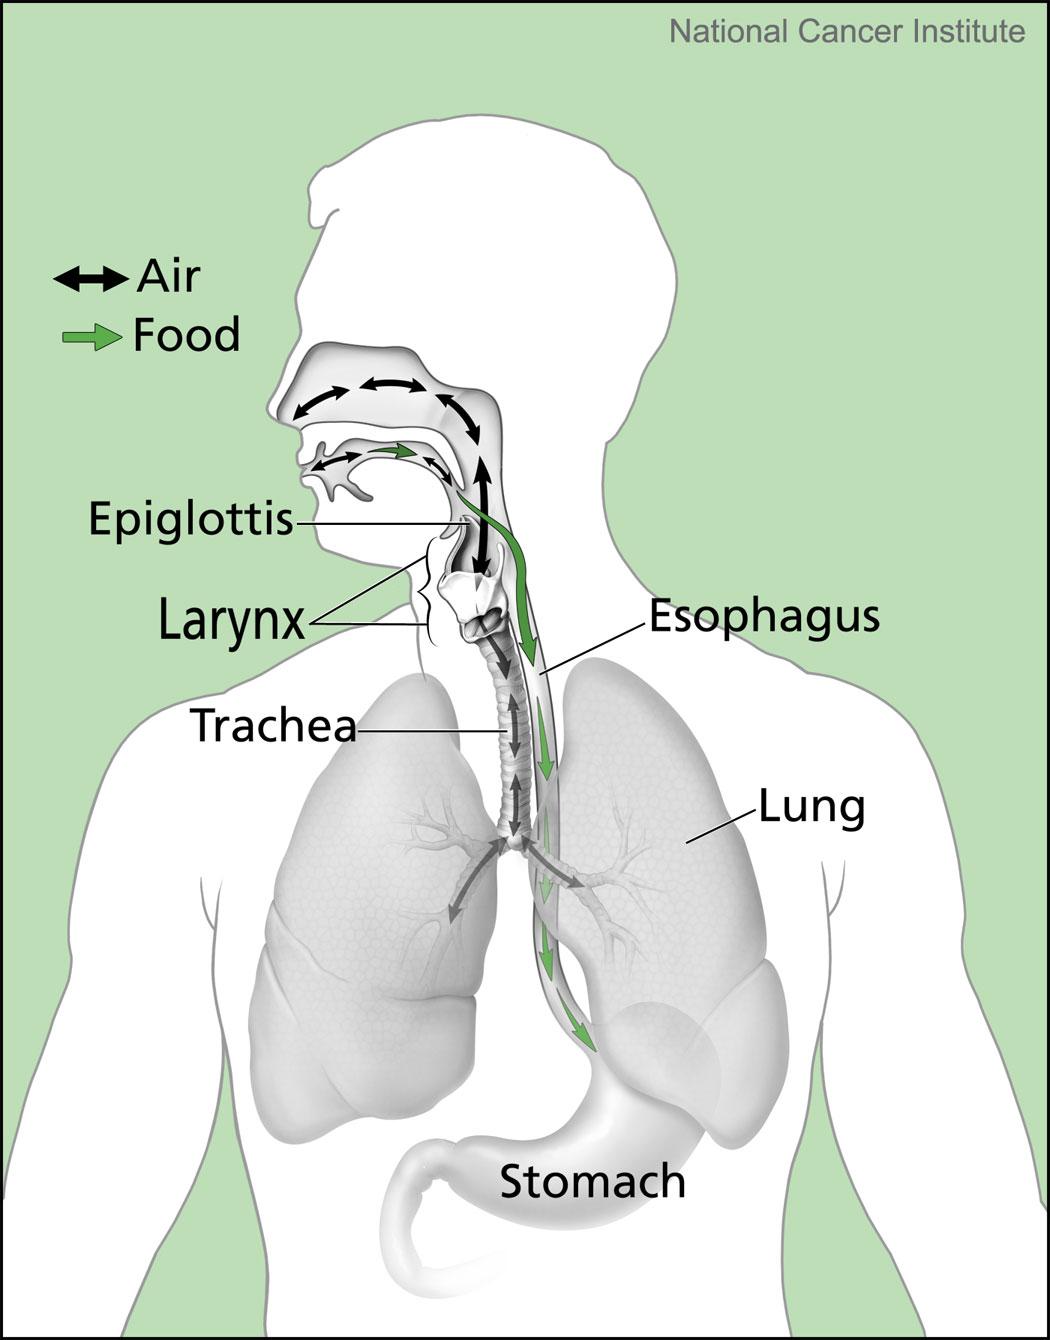 food tube diagram file air and food pathways jpg wikimedia commons  file air and food pathways jpg